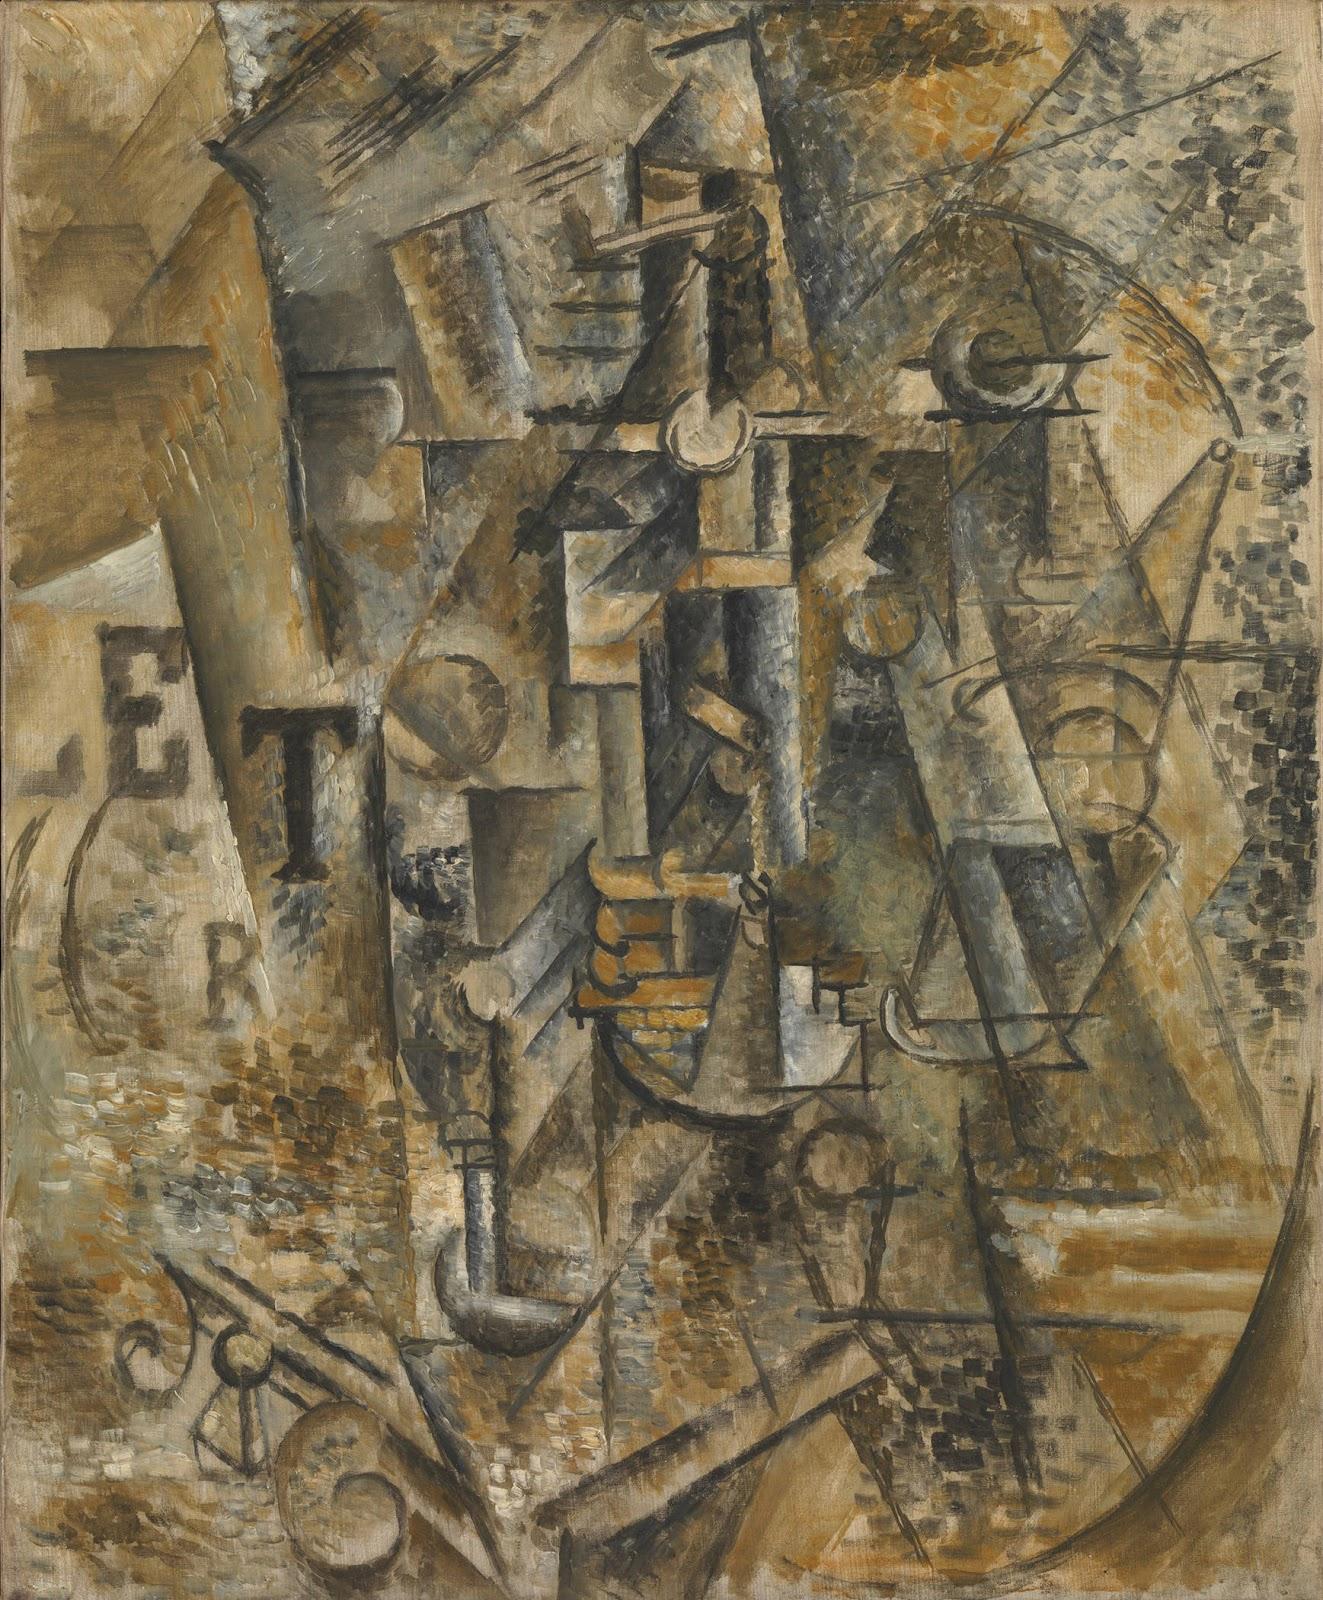 MUJER FRENTE AL ESPEJO- 1932 - PICASSO Pinterest